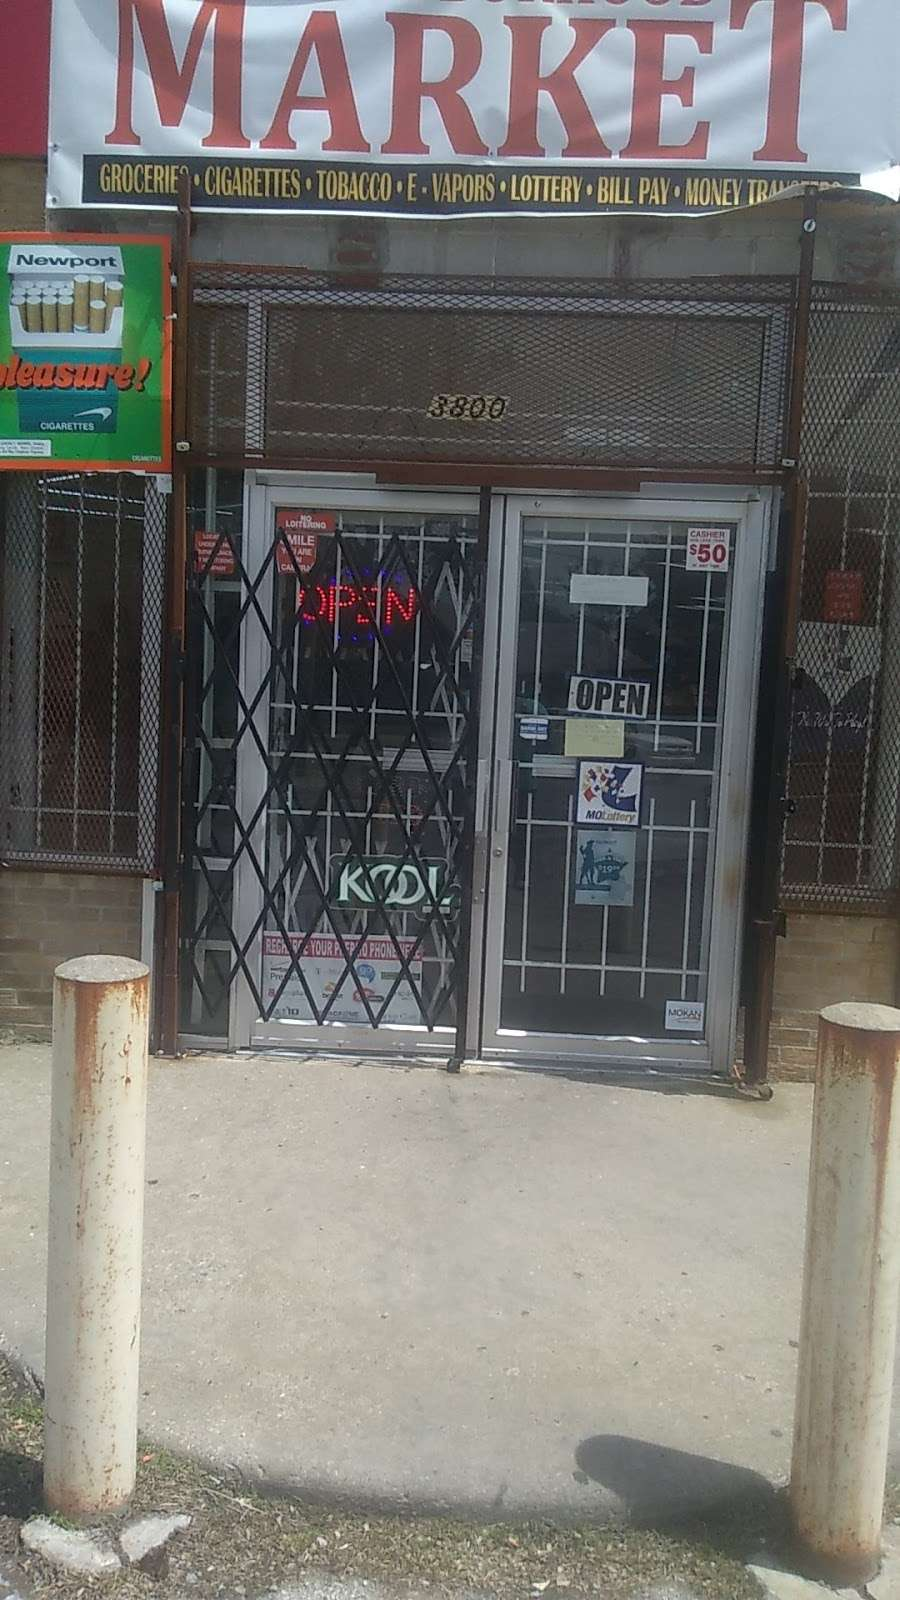 Neighborhood Market - store  | Photo 2 of 4 | Address: 3800 E 39th St, Kansas City, MO 64128, USA